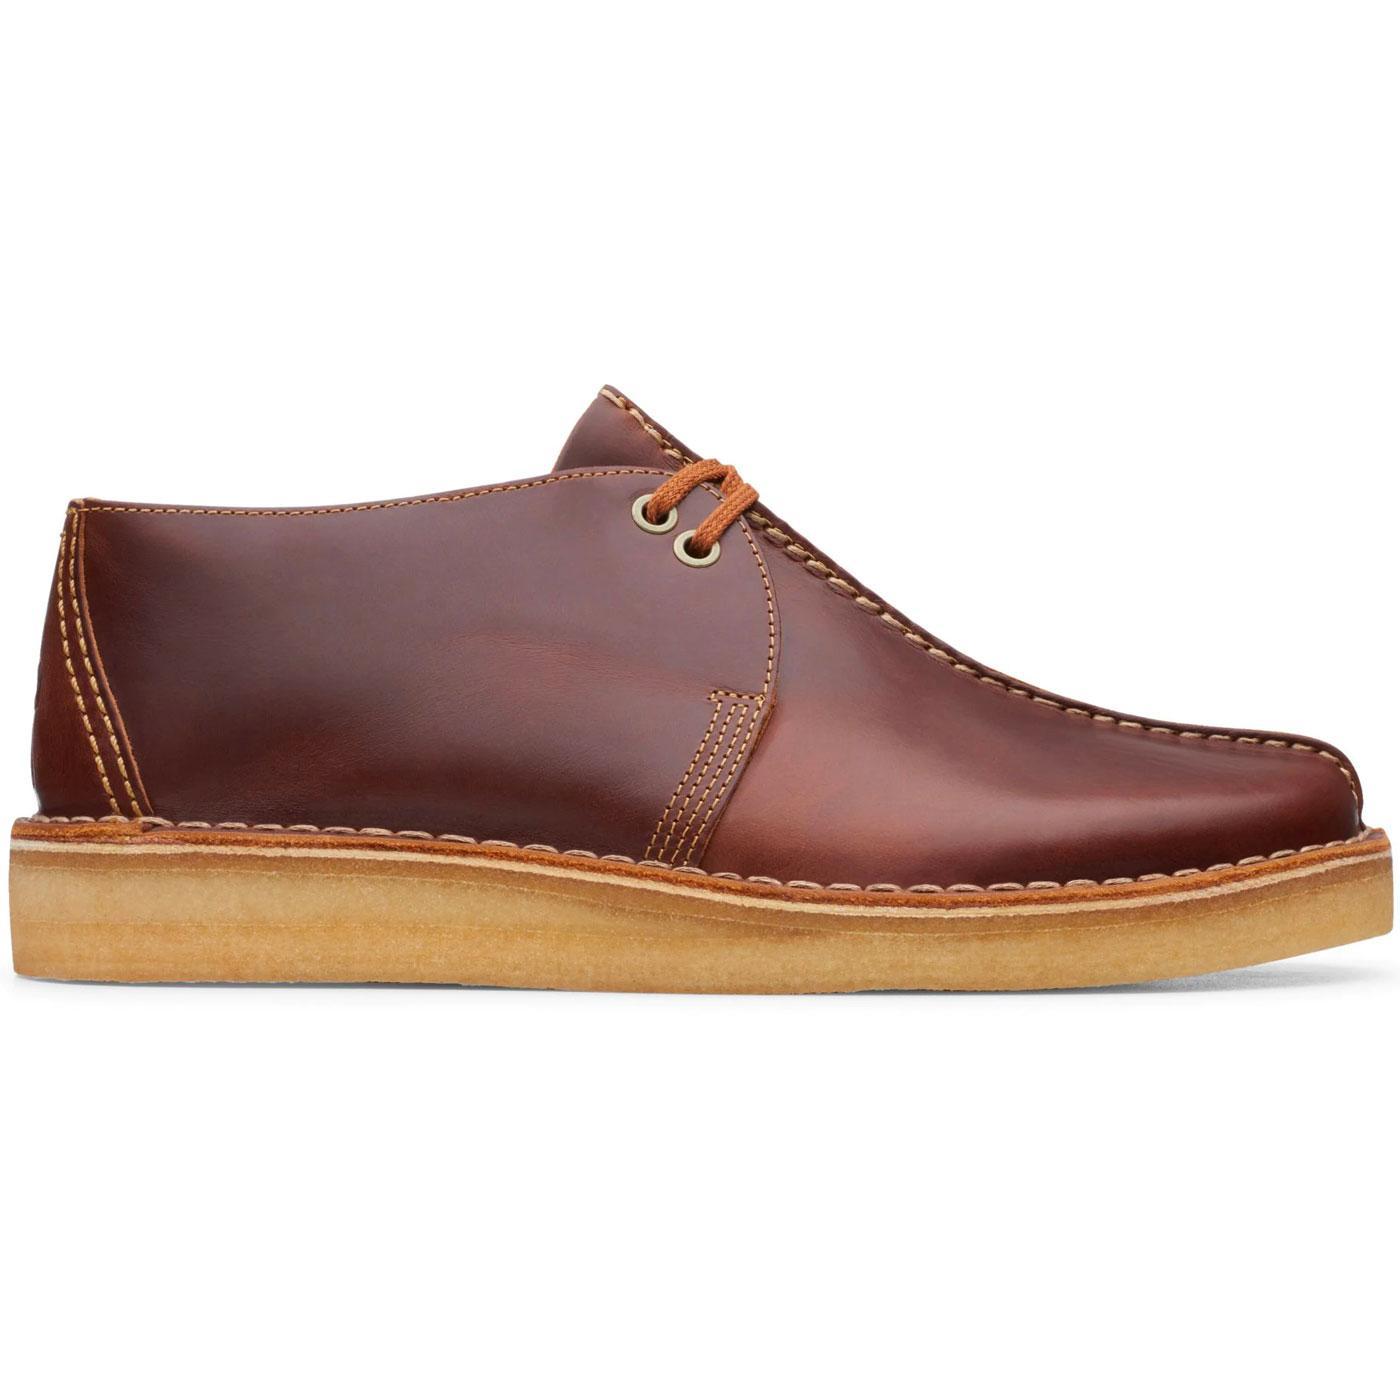 Desert Trek CLARKS ORIGINALS Tan Leather Shoes